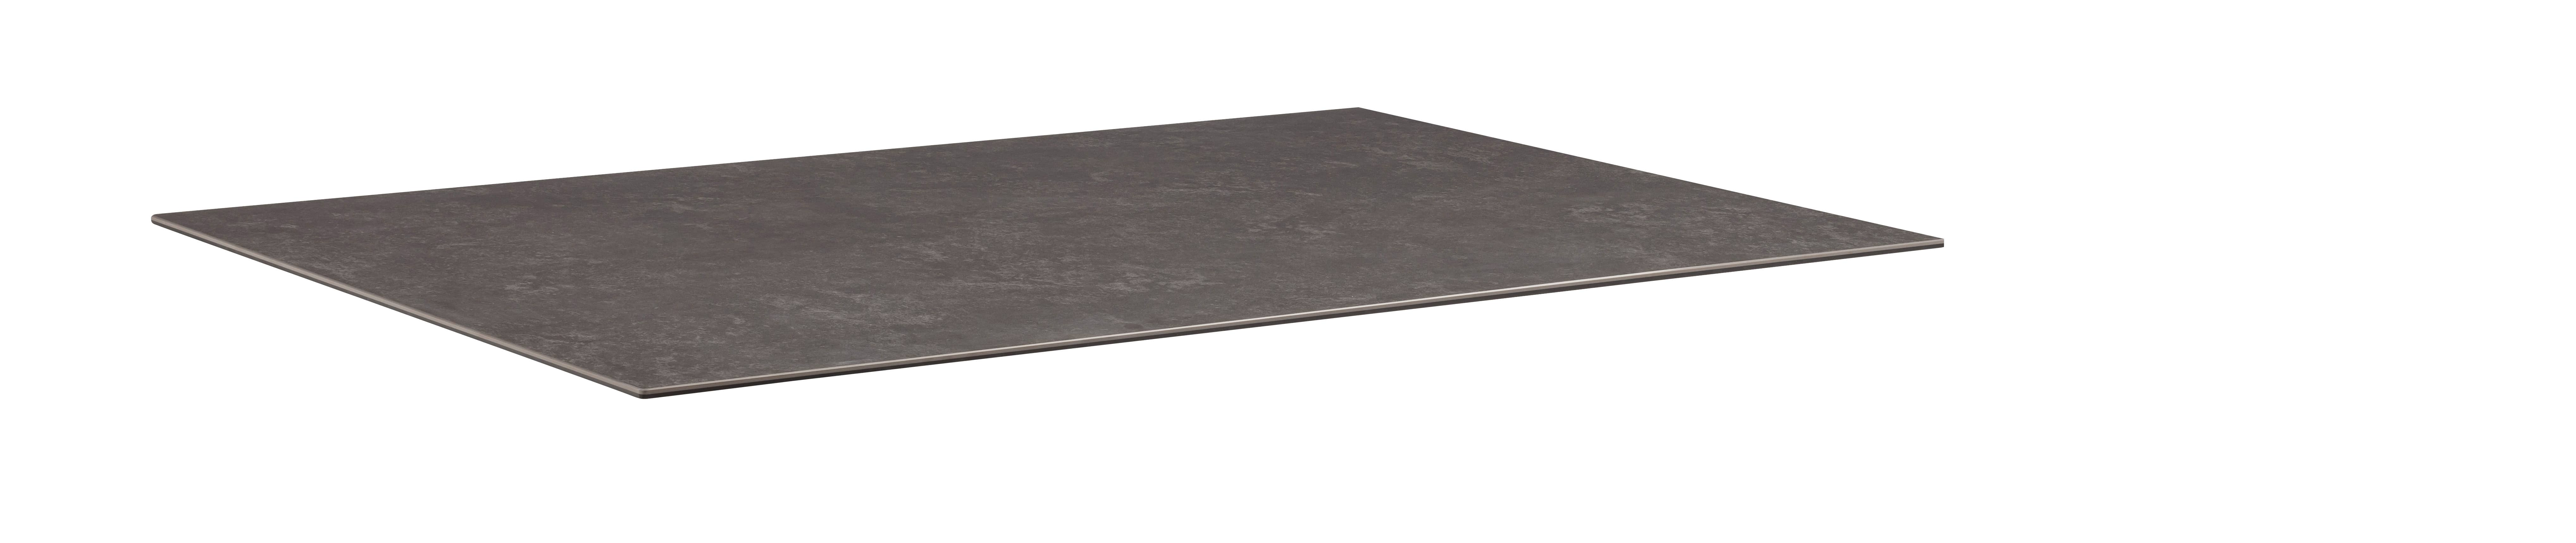 KERAMIK-GLAS Tischplatte 160 x 95 cm